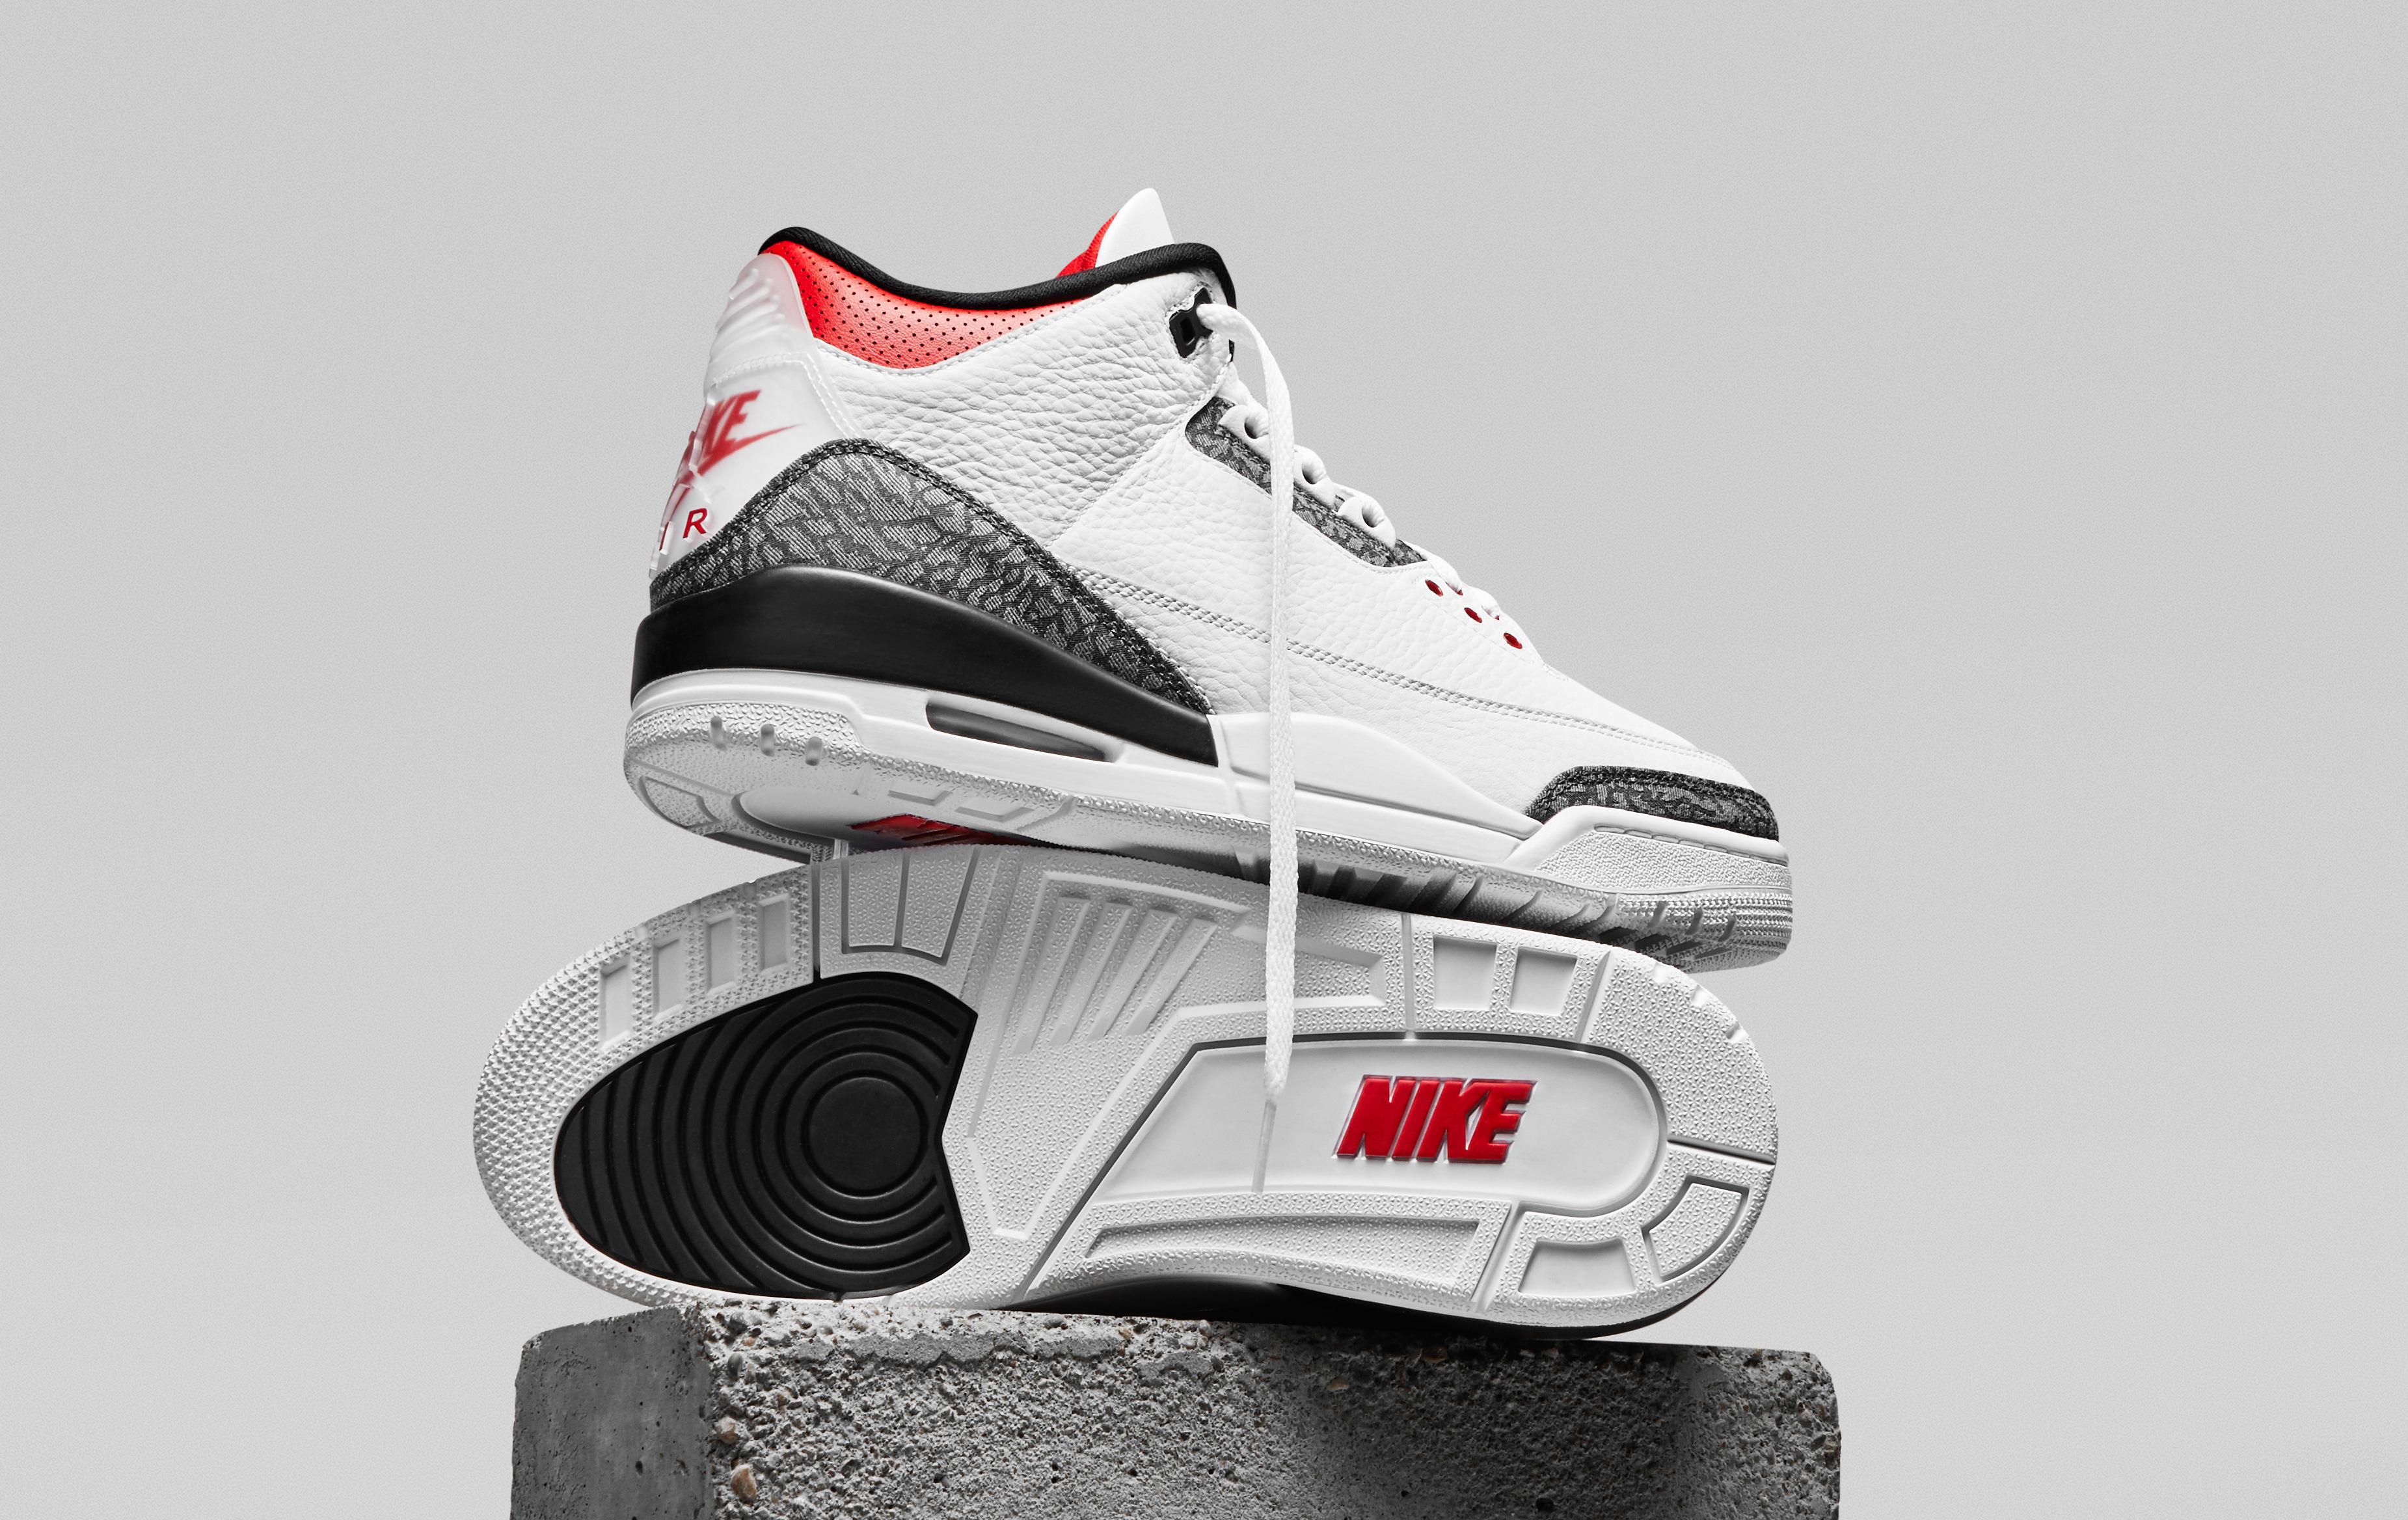 Air Jordan 3 Retro SE 'Denim' CZ6431-100 Side